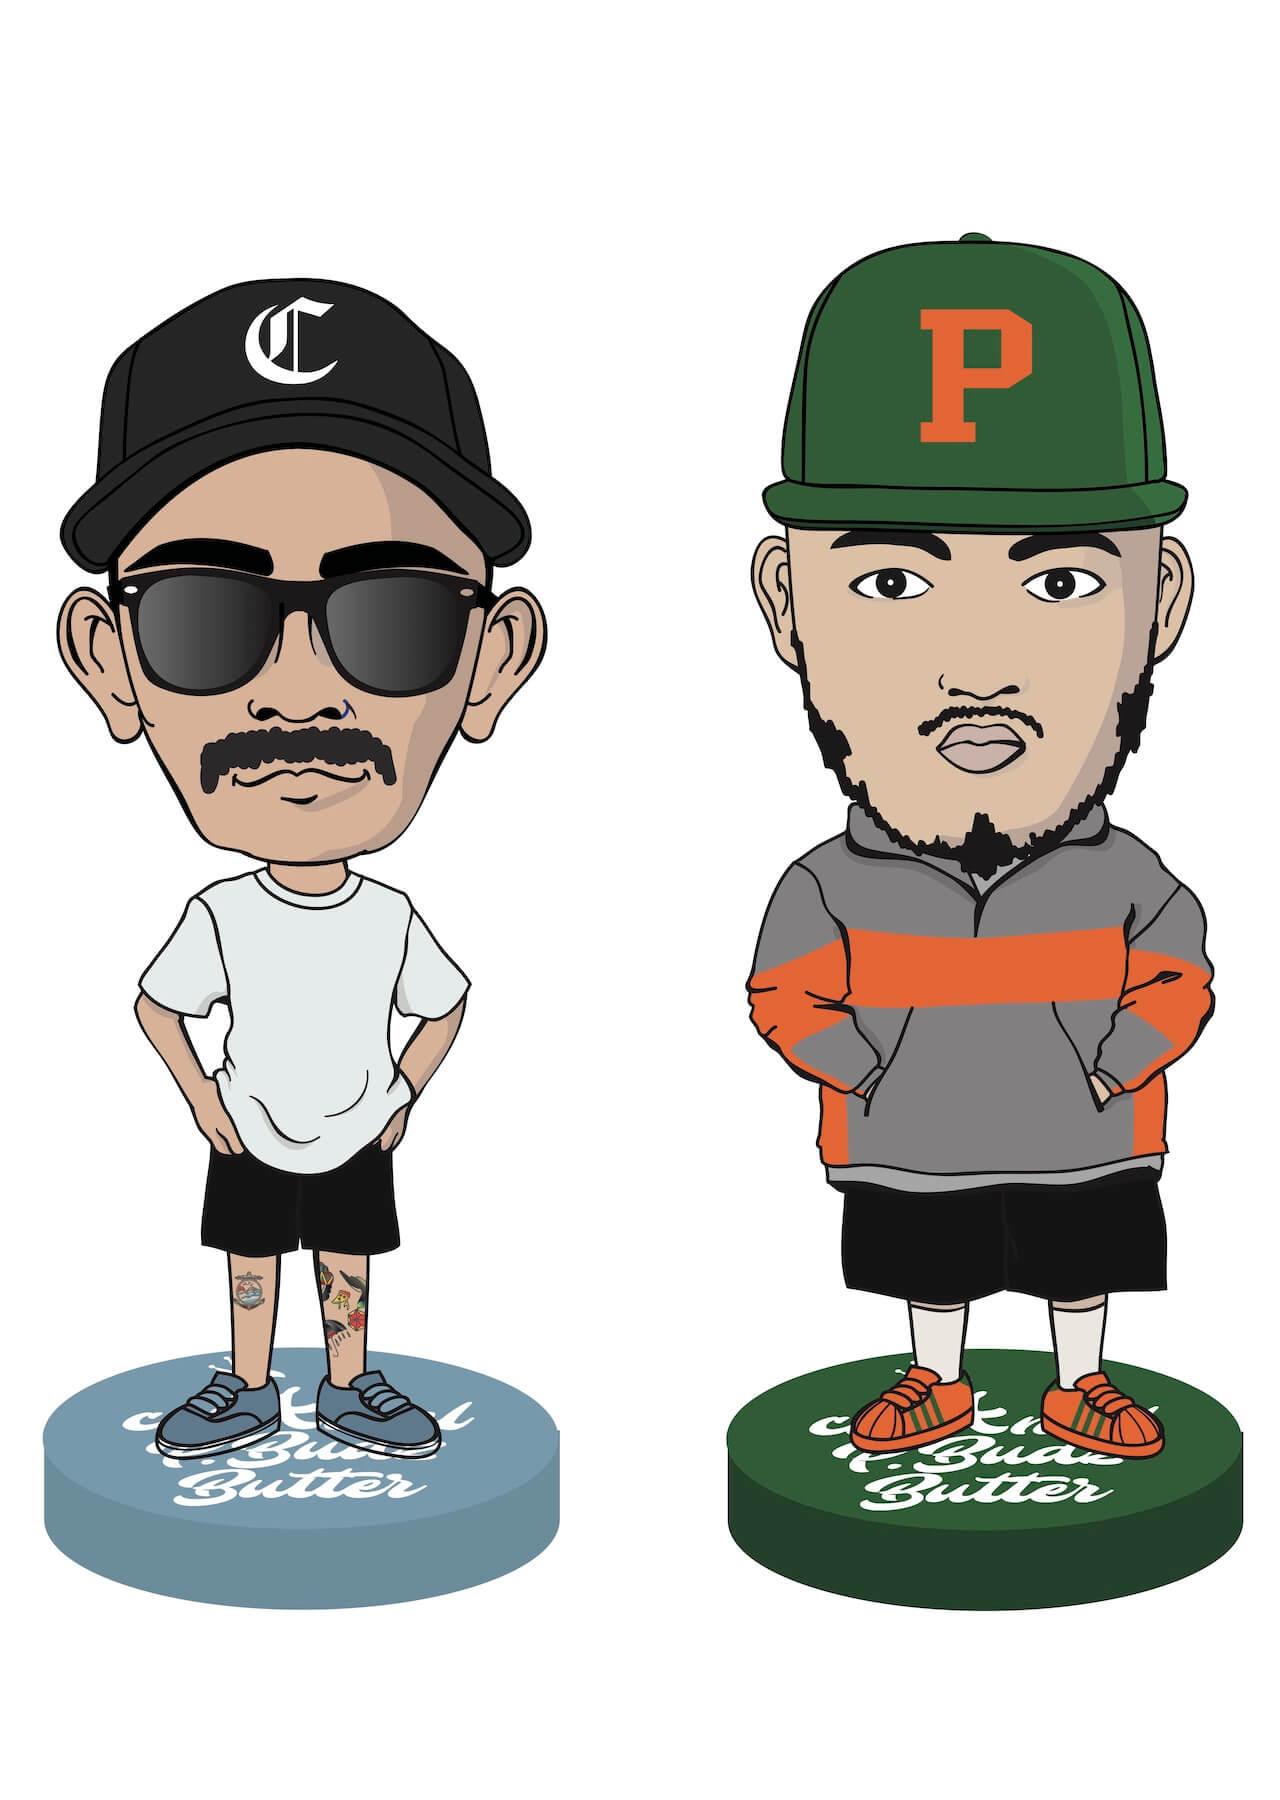 DJ POMとCamel Beatsによるビートプロジェクト<CaLAmel P.Budz Butter>が始動 music200620-calamel-pbudz-butter-1